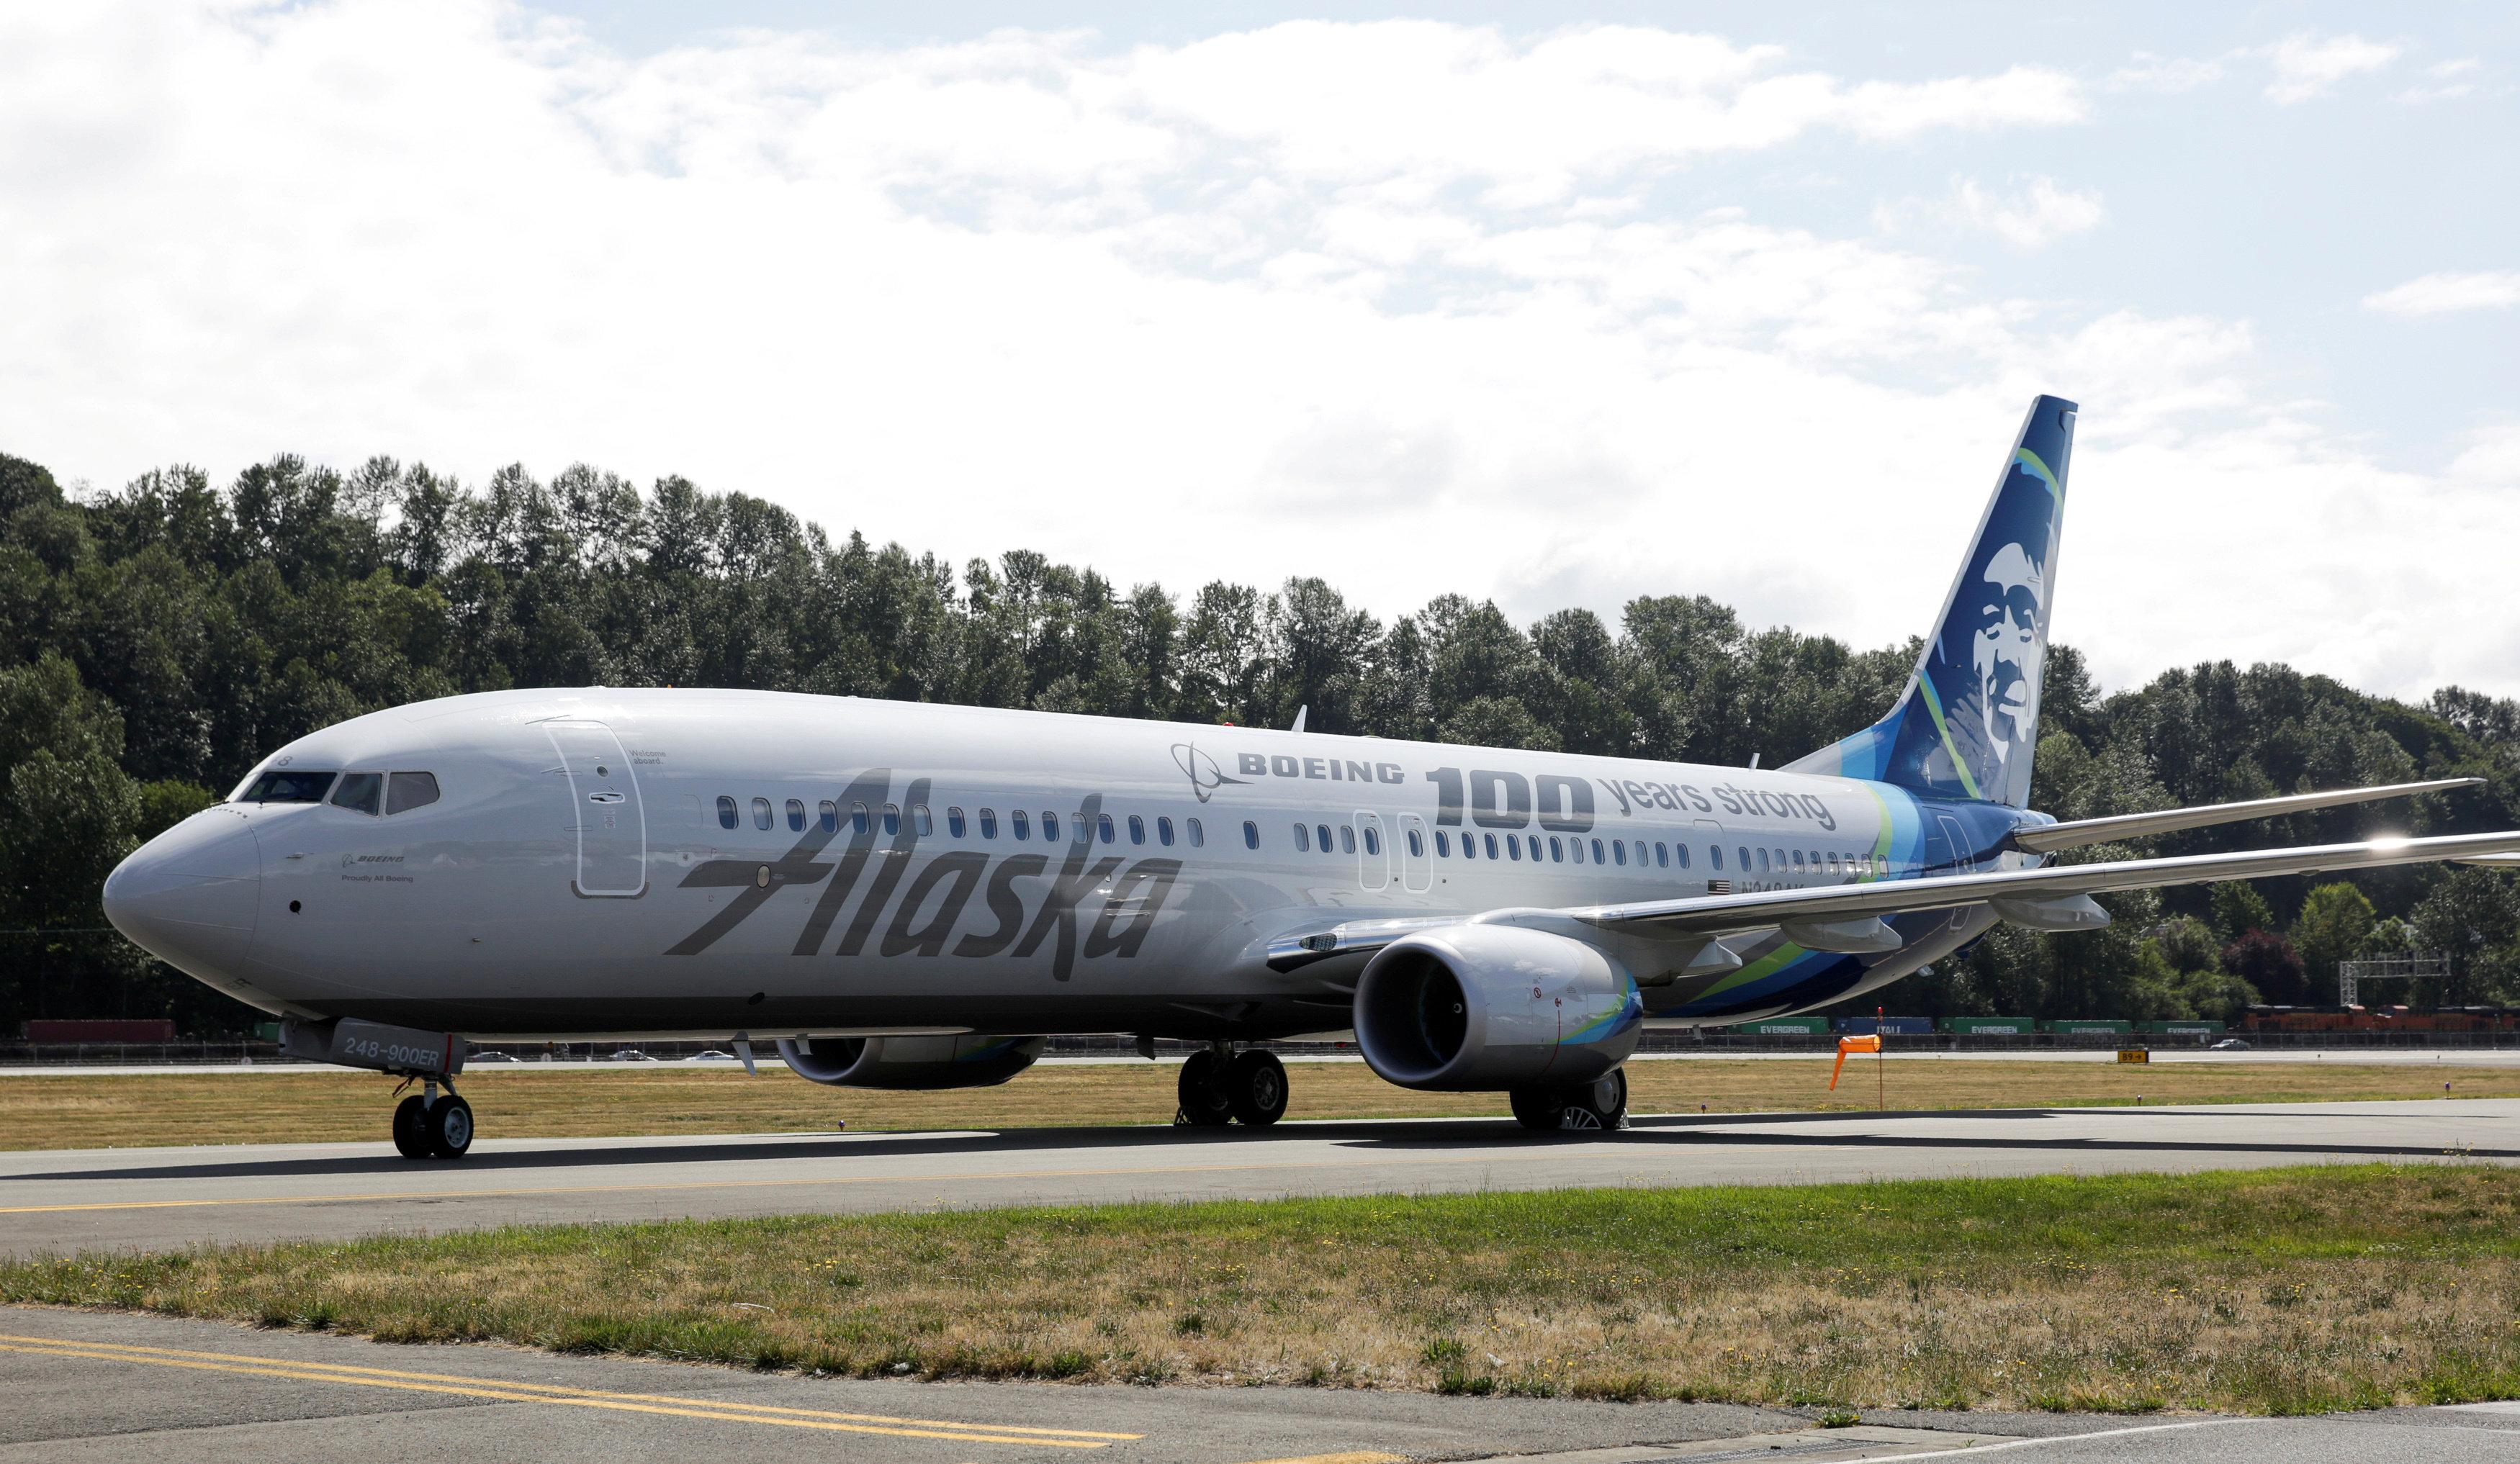 阿拉斯加航空公司(Alaska Airlines),示意圖。(路透)